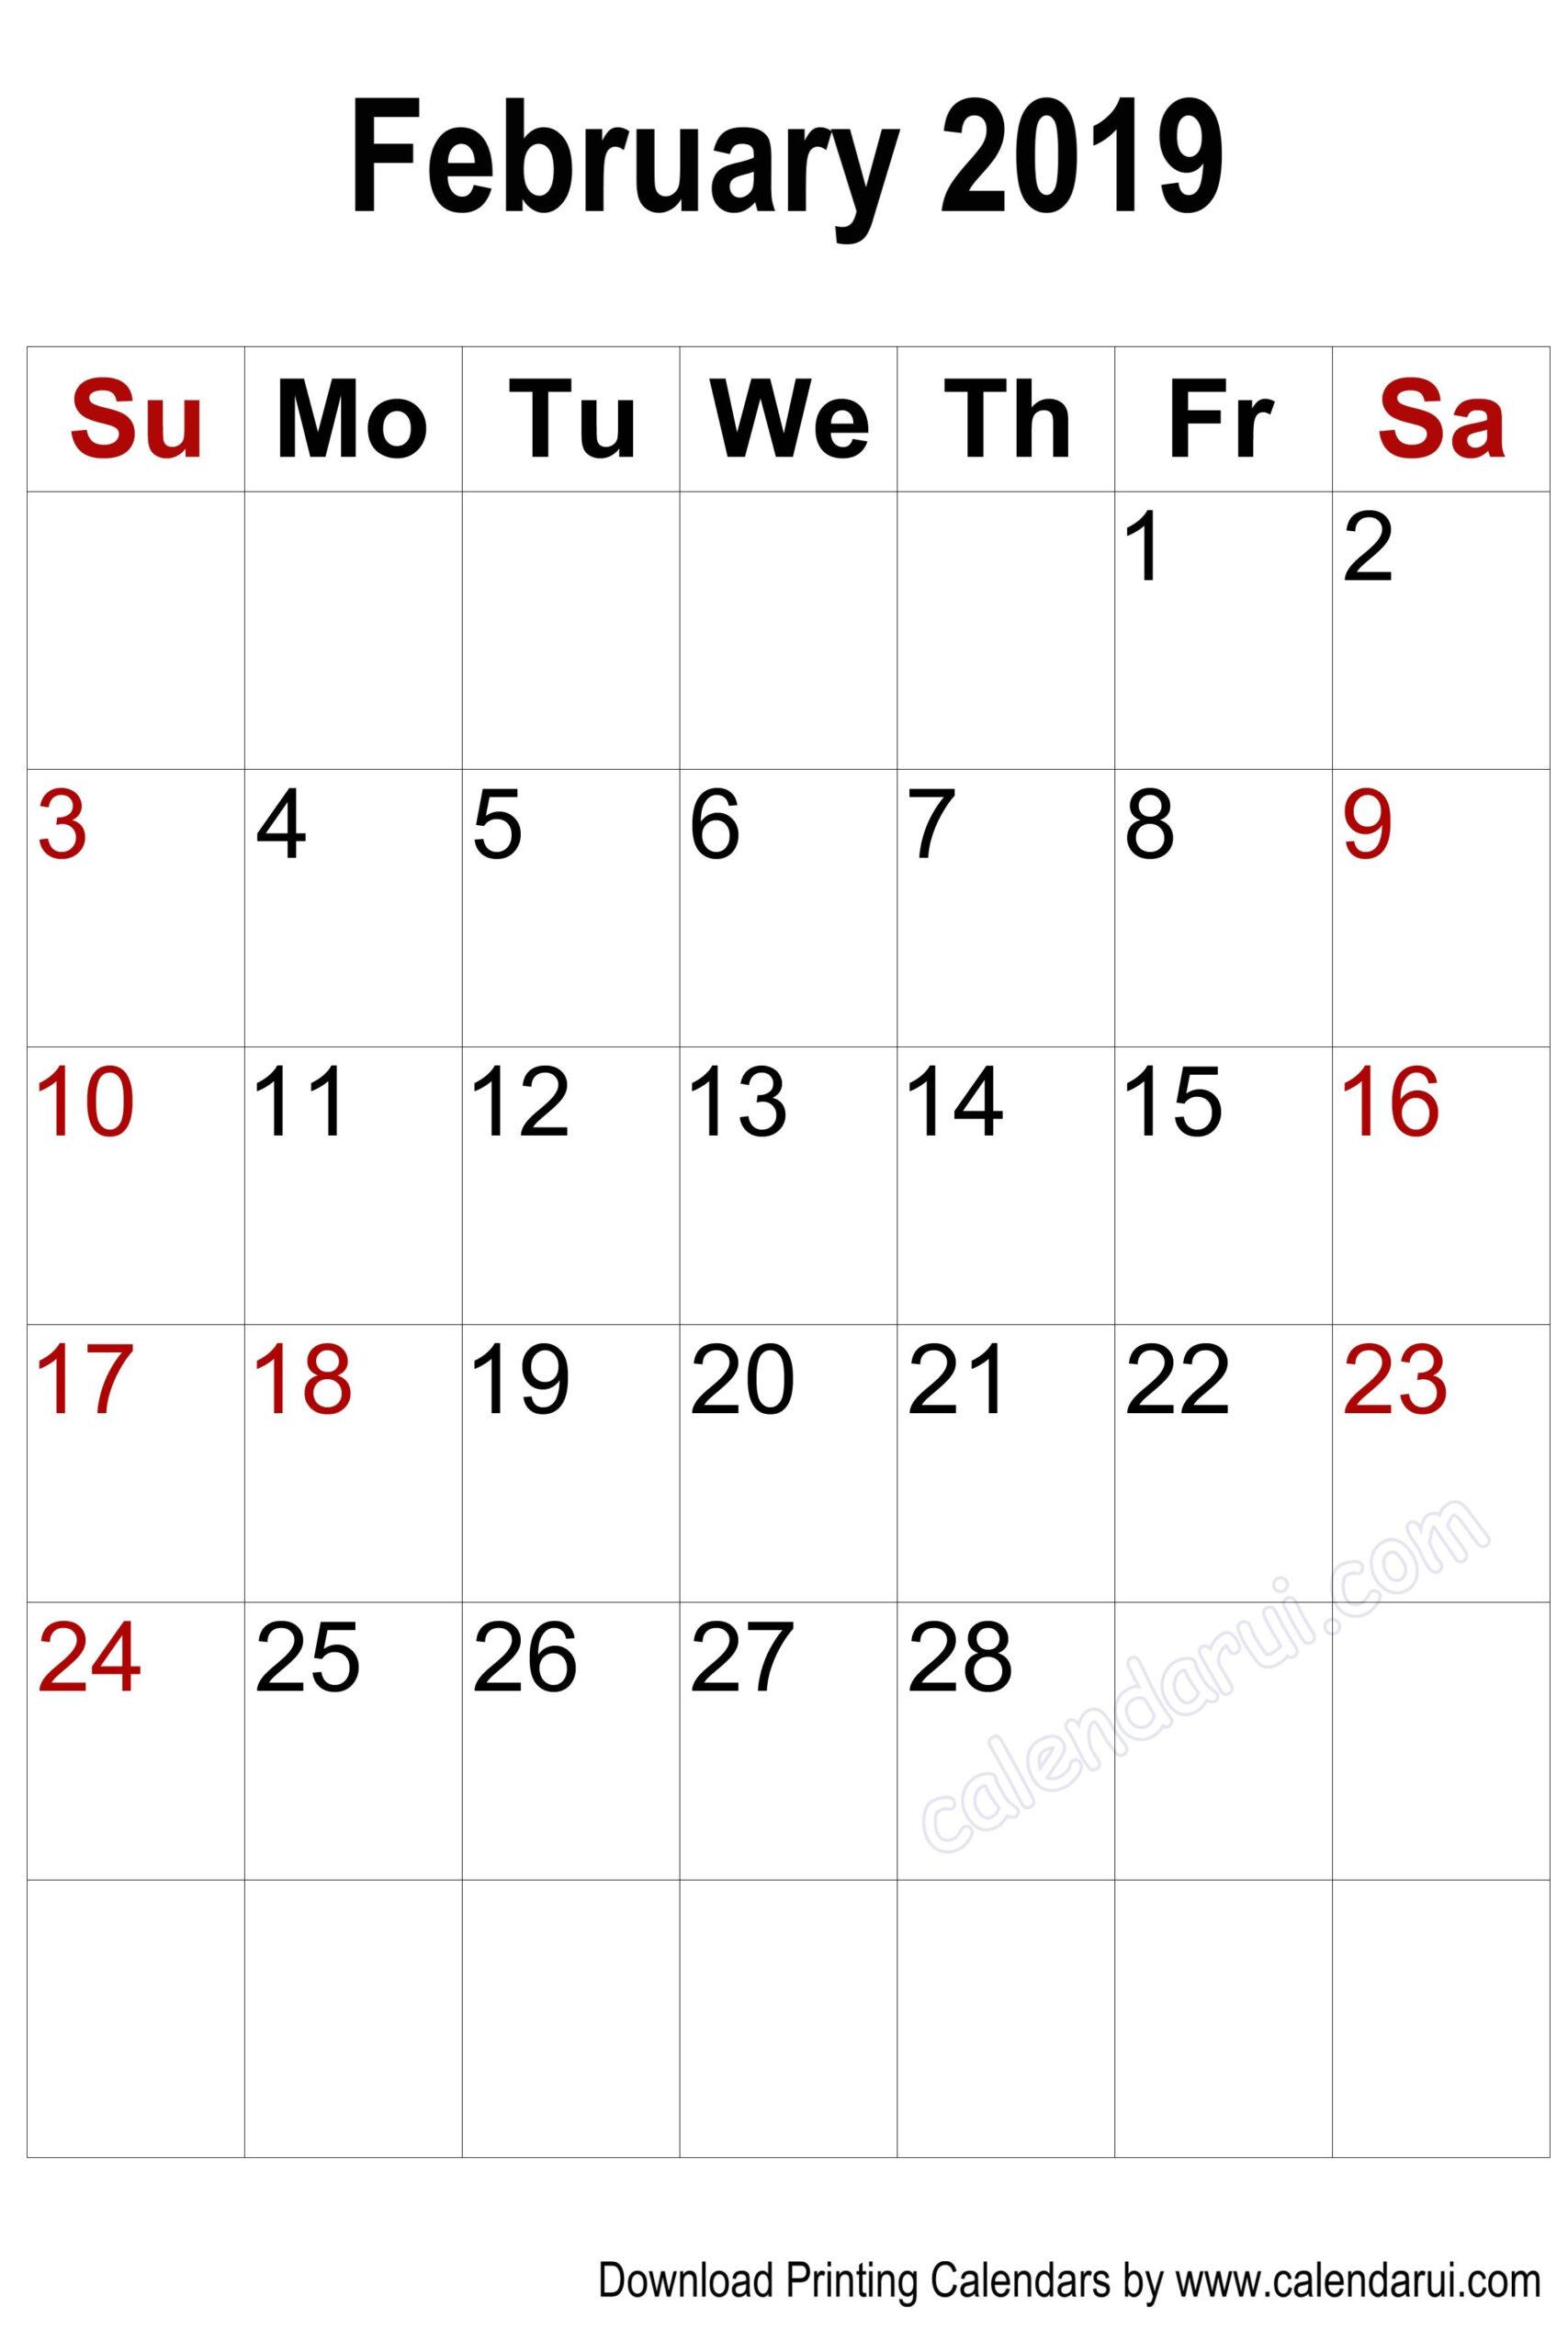 Vertical Blank February 2019 Calendar Printable | 2019